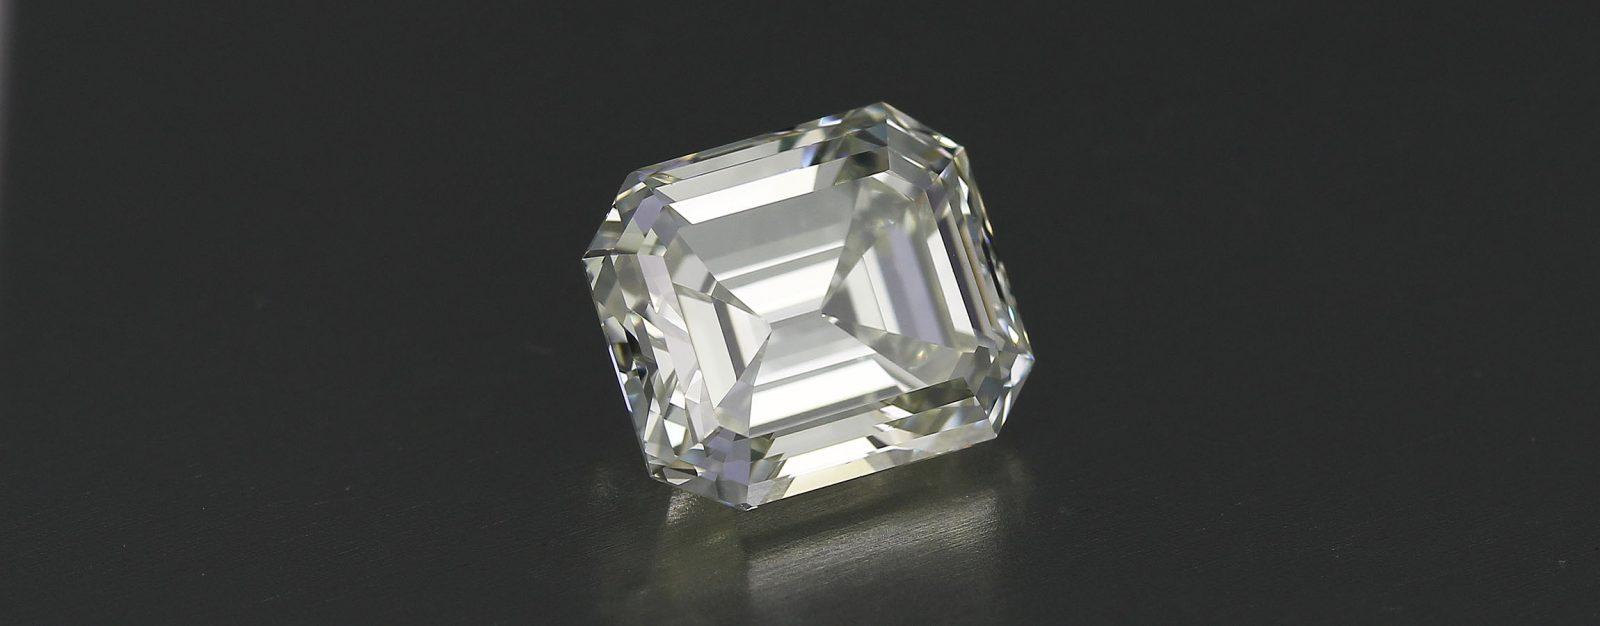 Vintage Emerald Cut Diamond circa 1910-1930 — 4.40 carat